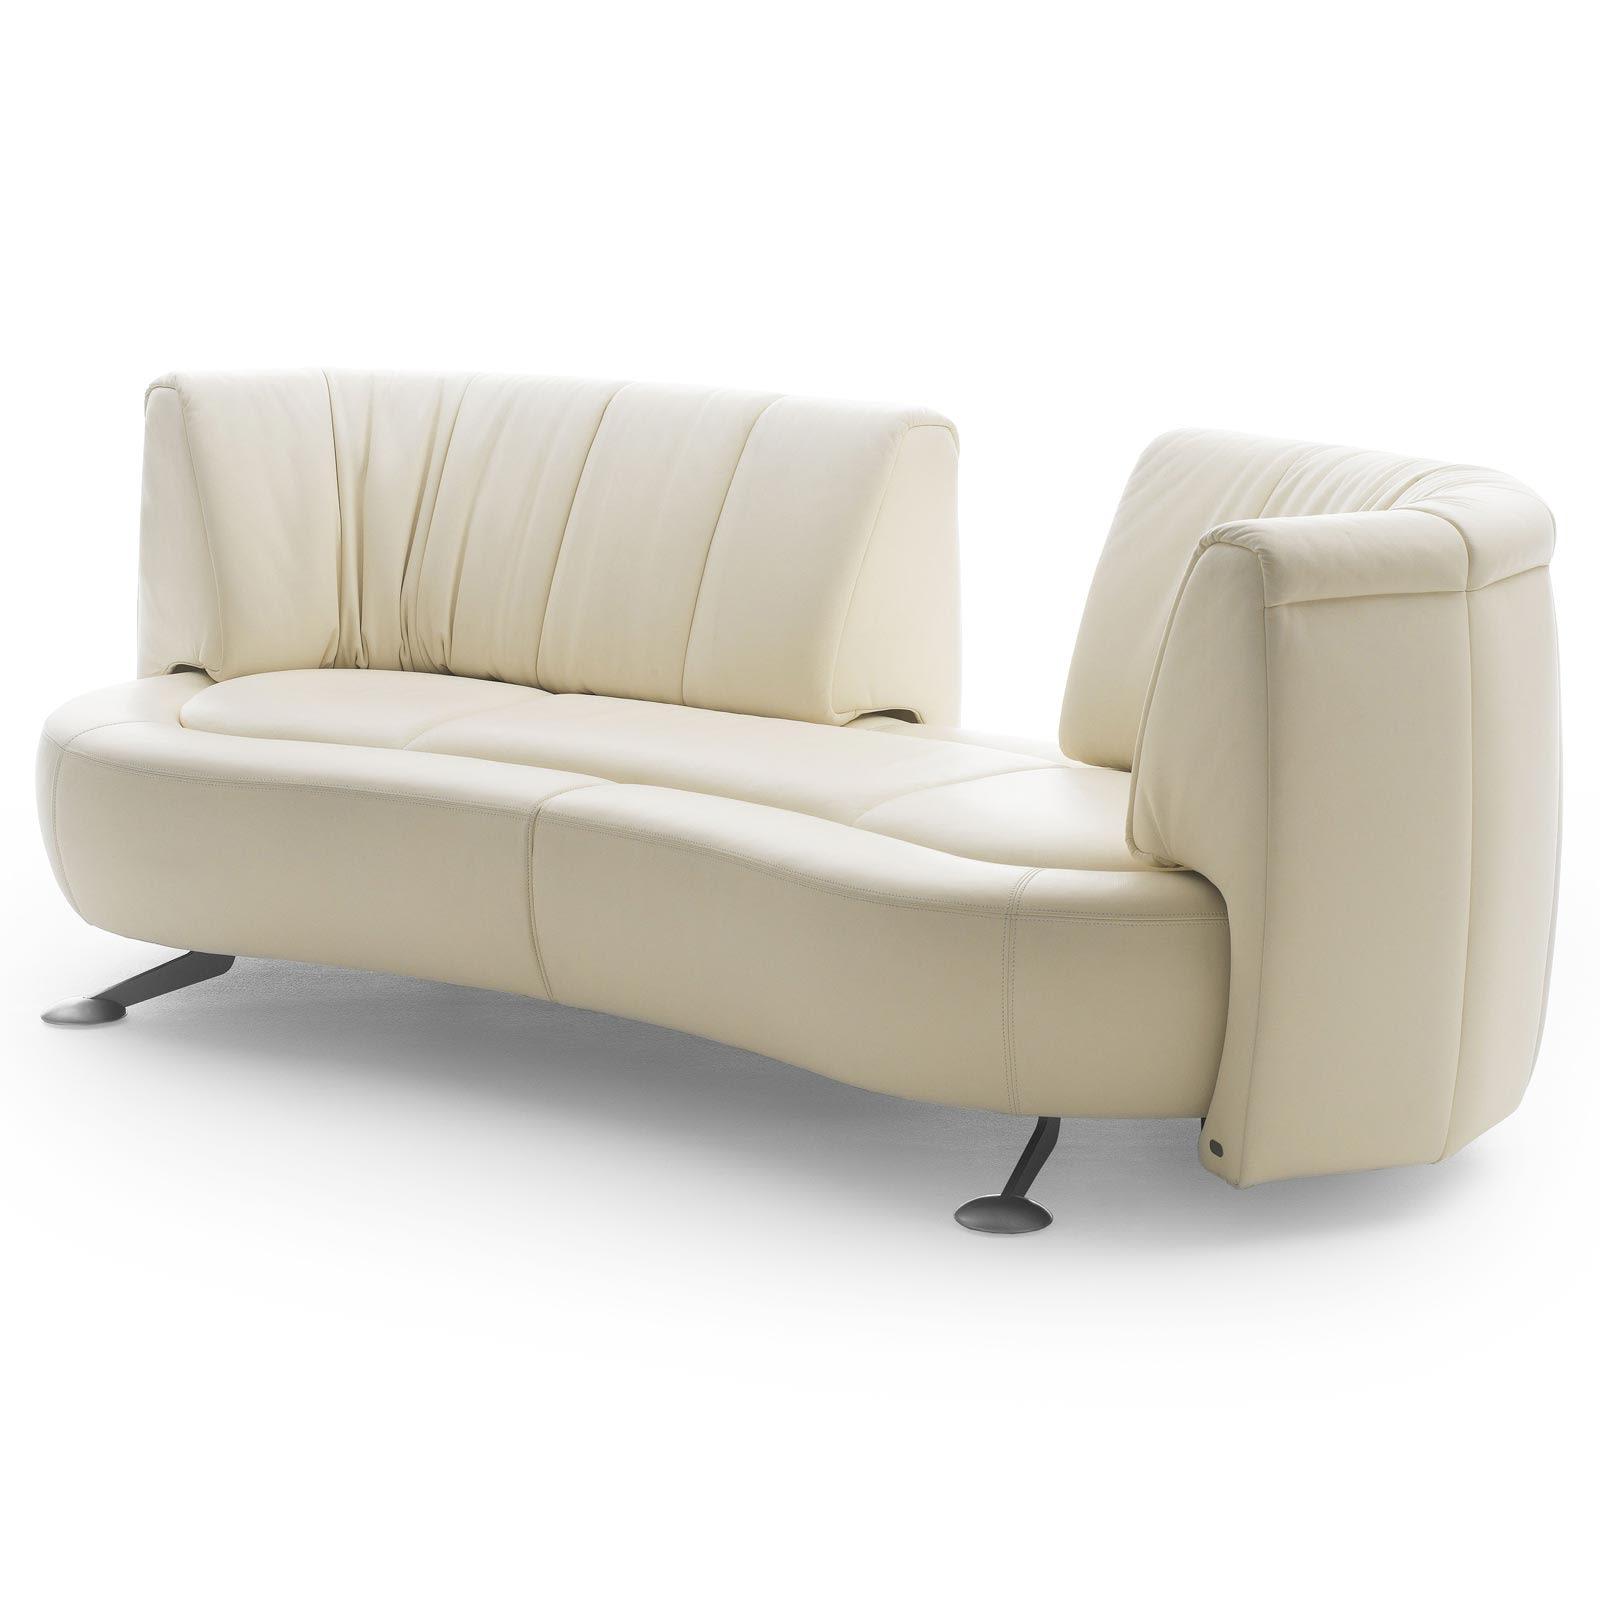 sofa ds 164 von de sede. Black Bedroom Furniture Sets. Home Design Ideas